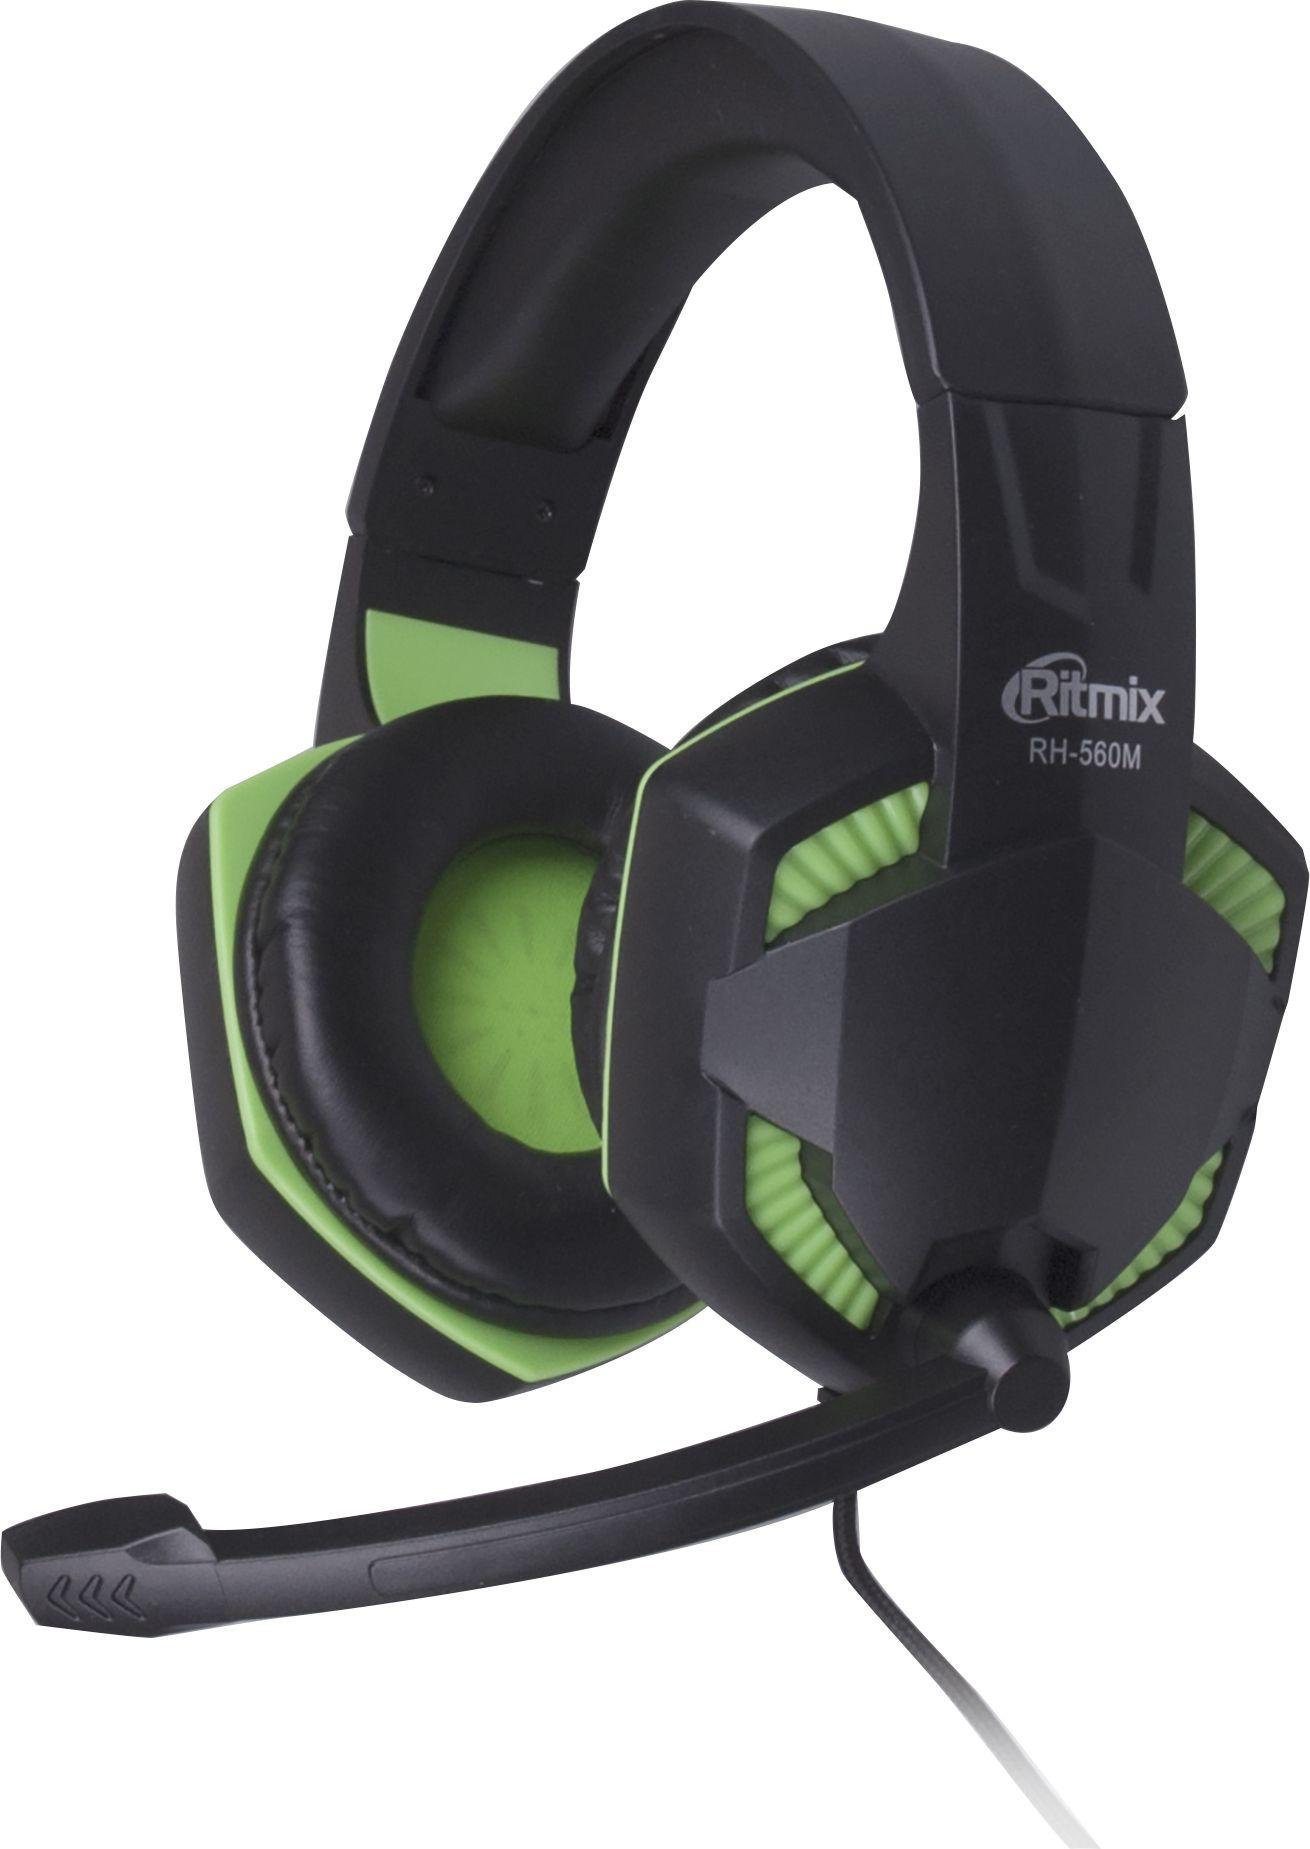 Компьютерная гарнитура Ritmix RH-560M, Gaming цена и фото